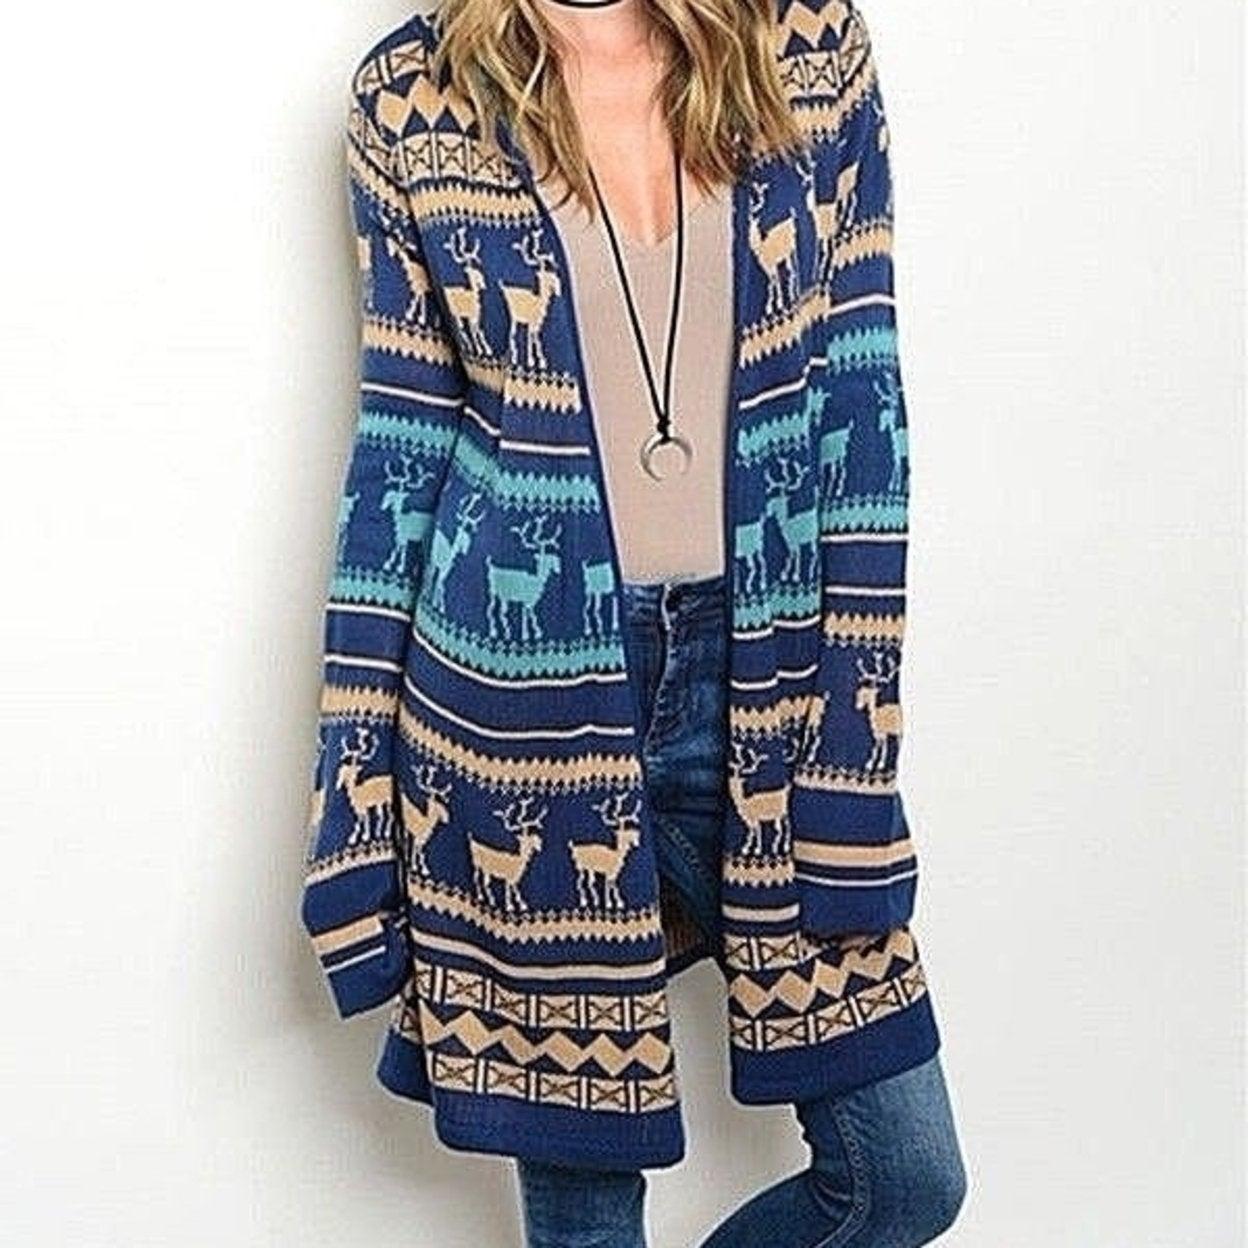 sizes S//M//L Women/'s Aztec Open Knit Top Sweater Cardigan Blue//Burgundy